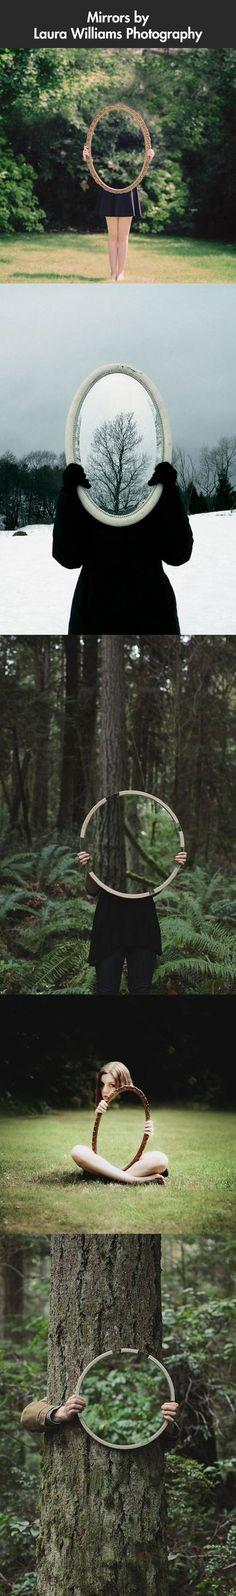 Playing with mirrors… what a great idea! **We Offer Custom Picture #Framing, #ArtRestoration & #Art Gallery! Tweet Us: www.twitter.com/AFrameOfArt, Like us on FB: www.facebook.com/AFrameOfArt, Our Home www.AFrameOfArt.com